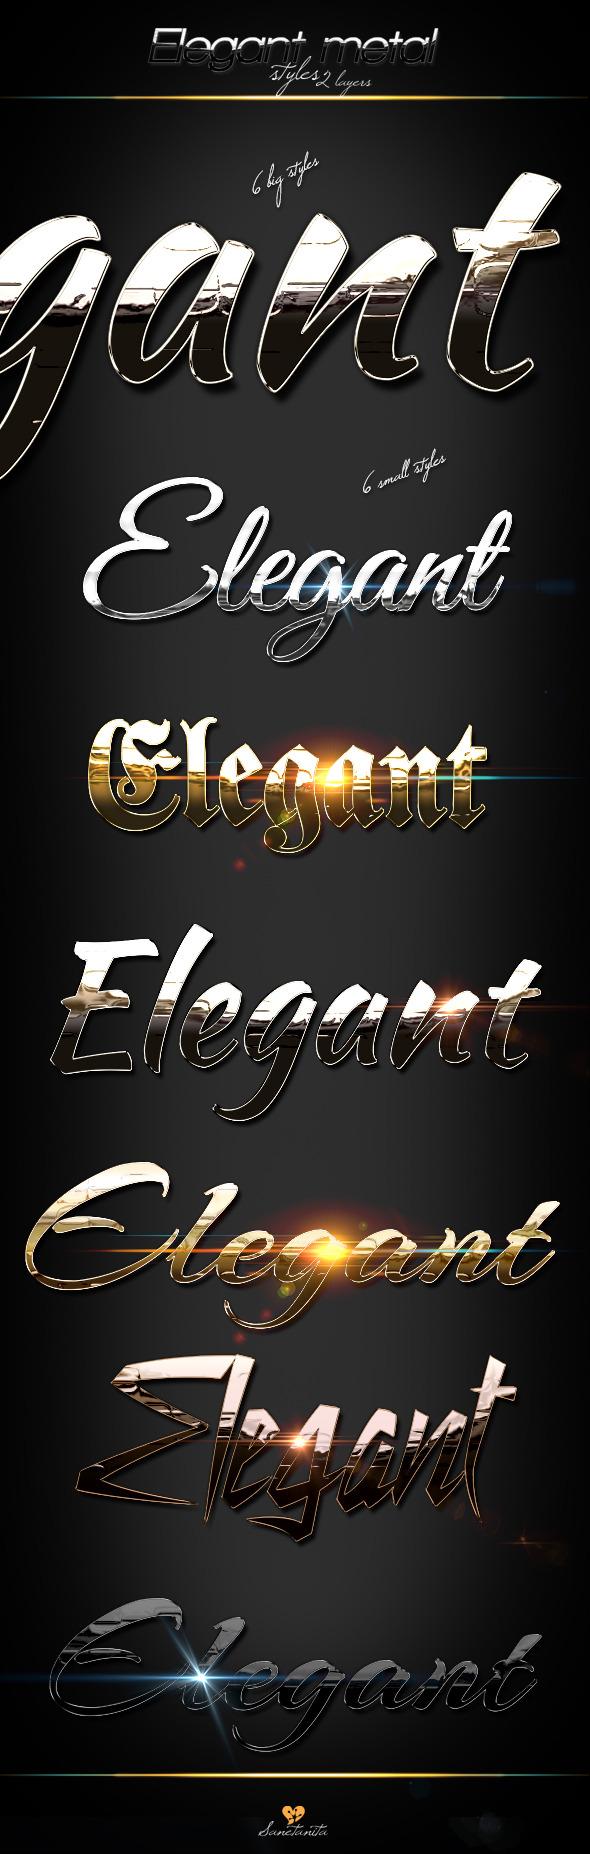 GraphicRiver Elegant Metal Styles 9600775